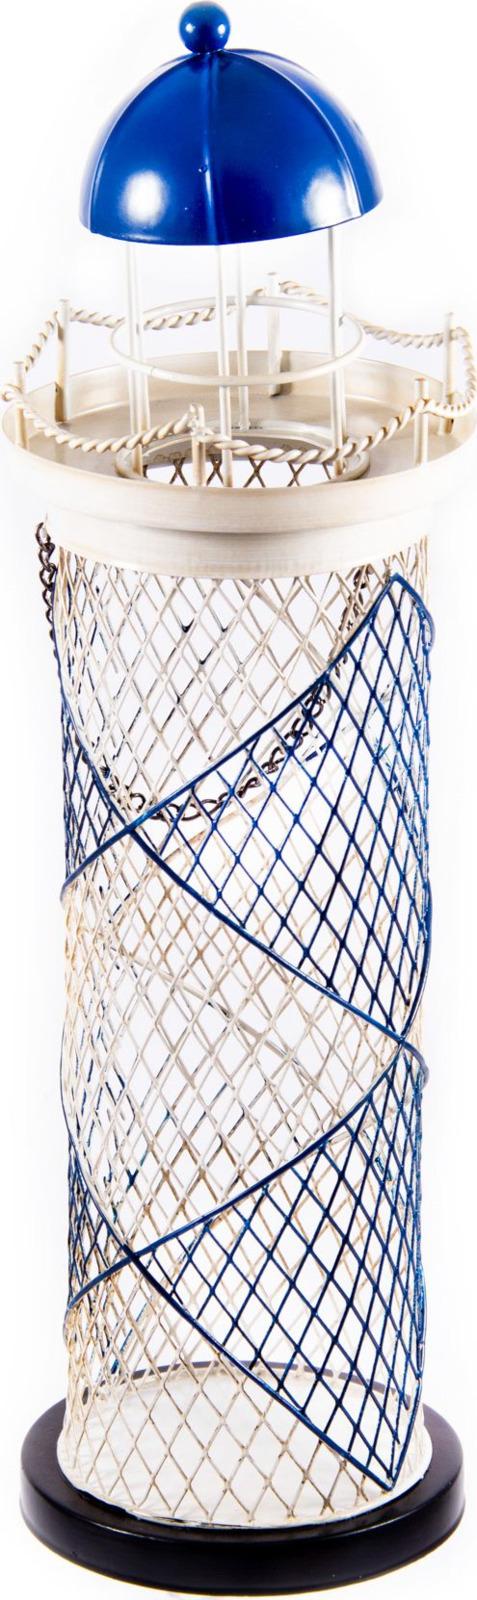 "Подставка под бутылку Русские подарки ""Маяк"", 88032, с накопителем для пробок, 12 х 12 х 37 см"